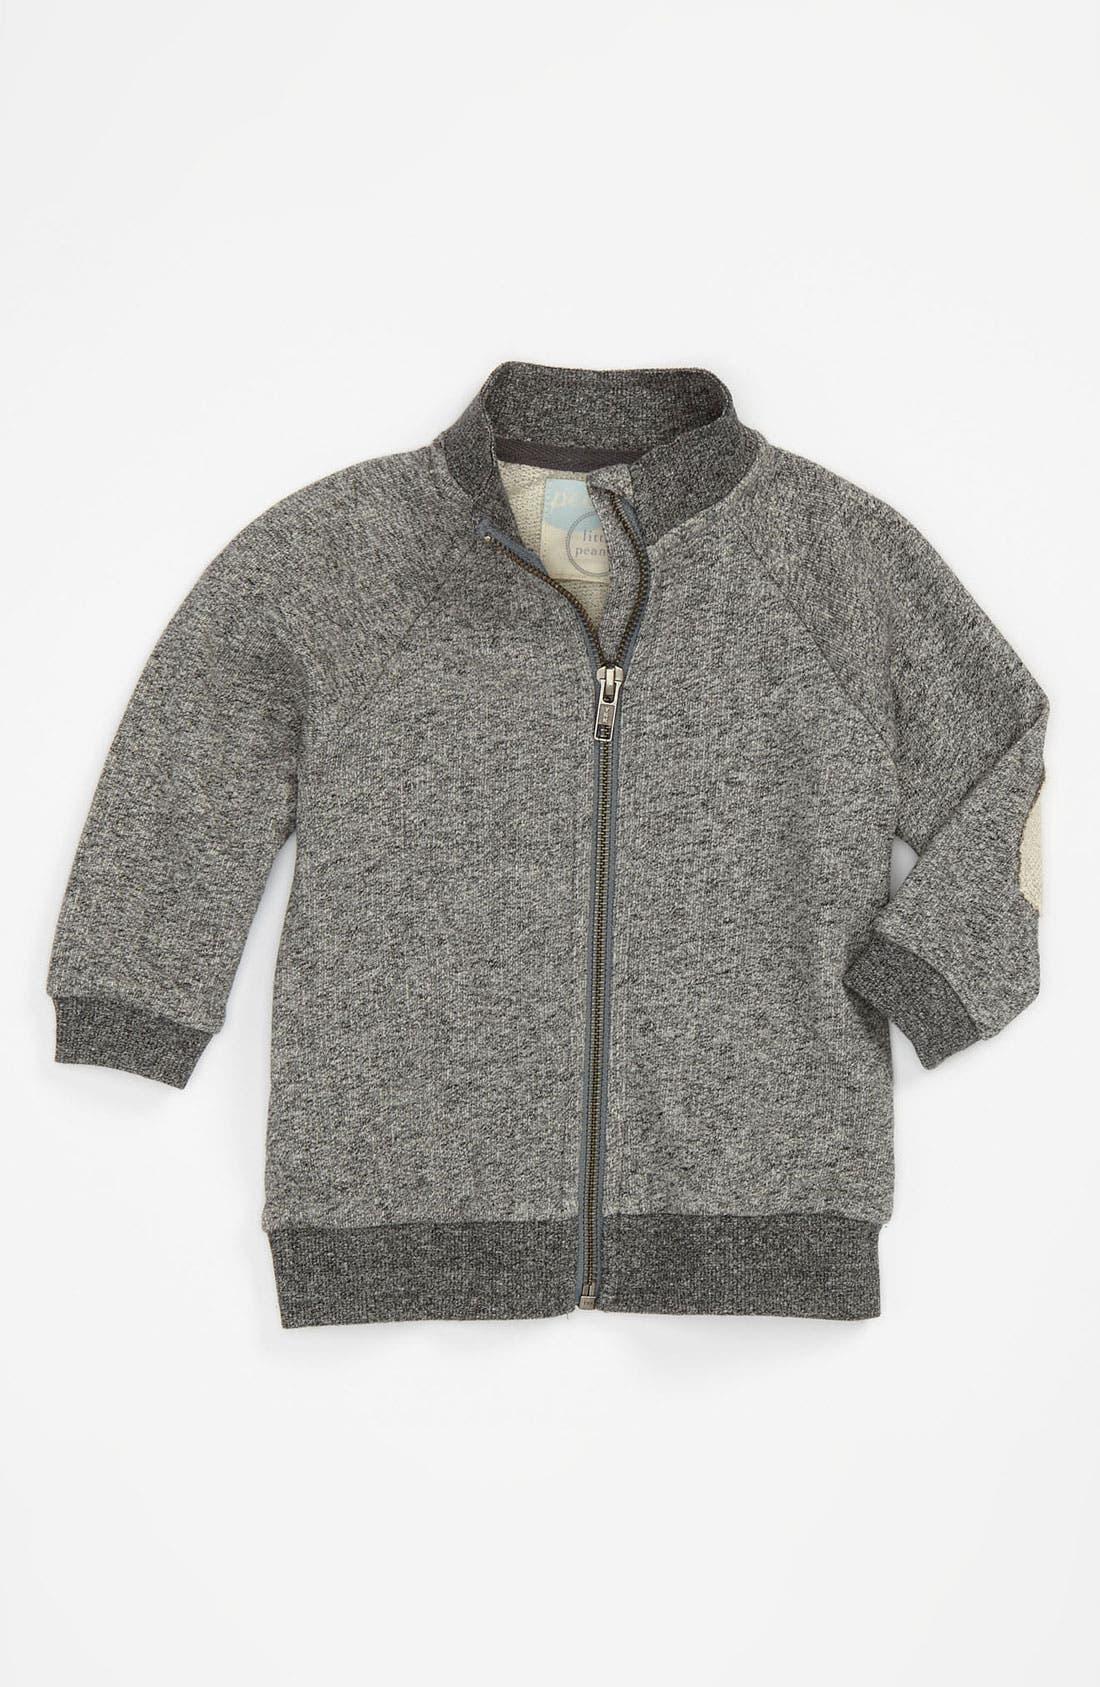 Main Image - Peek 'Caiden' Sweater (Infant)